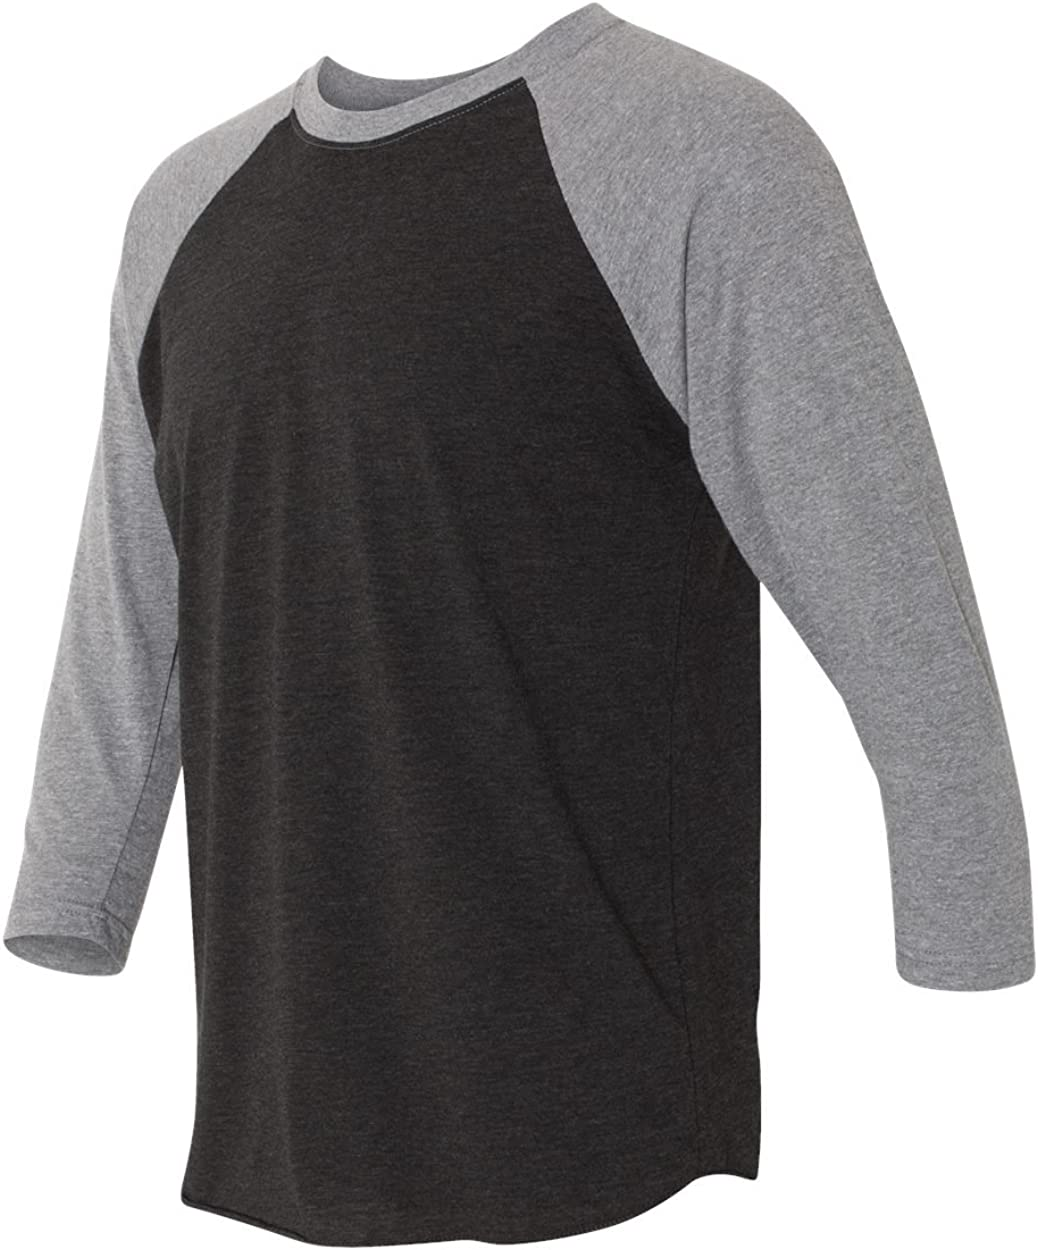 Cindy Apparel Next Level 6051 Women\'s Tri-Blend 3/4-Sleeve Raglan Tee Shirt 71w9NCb646L